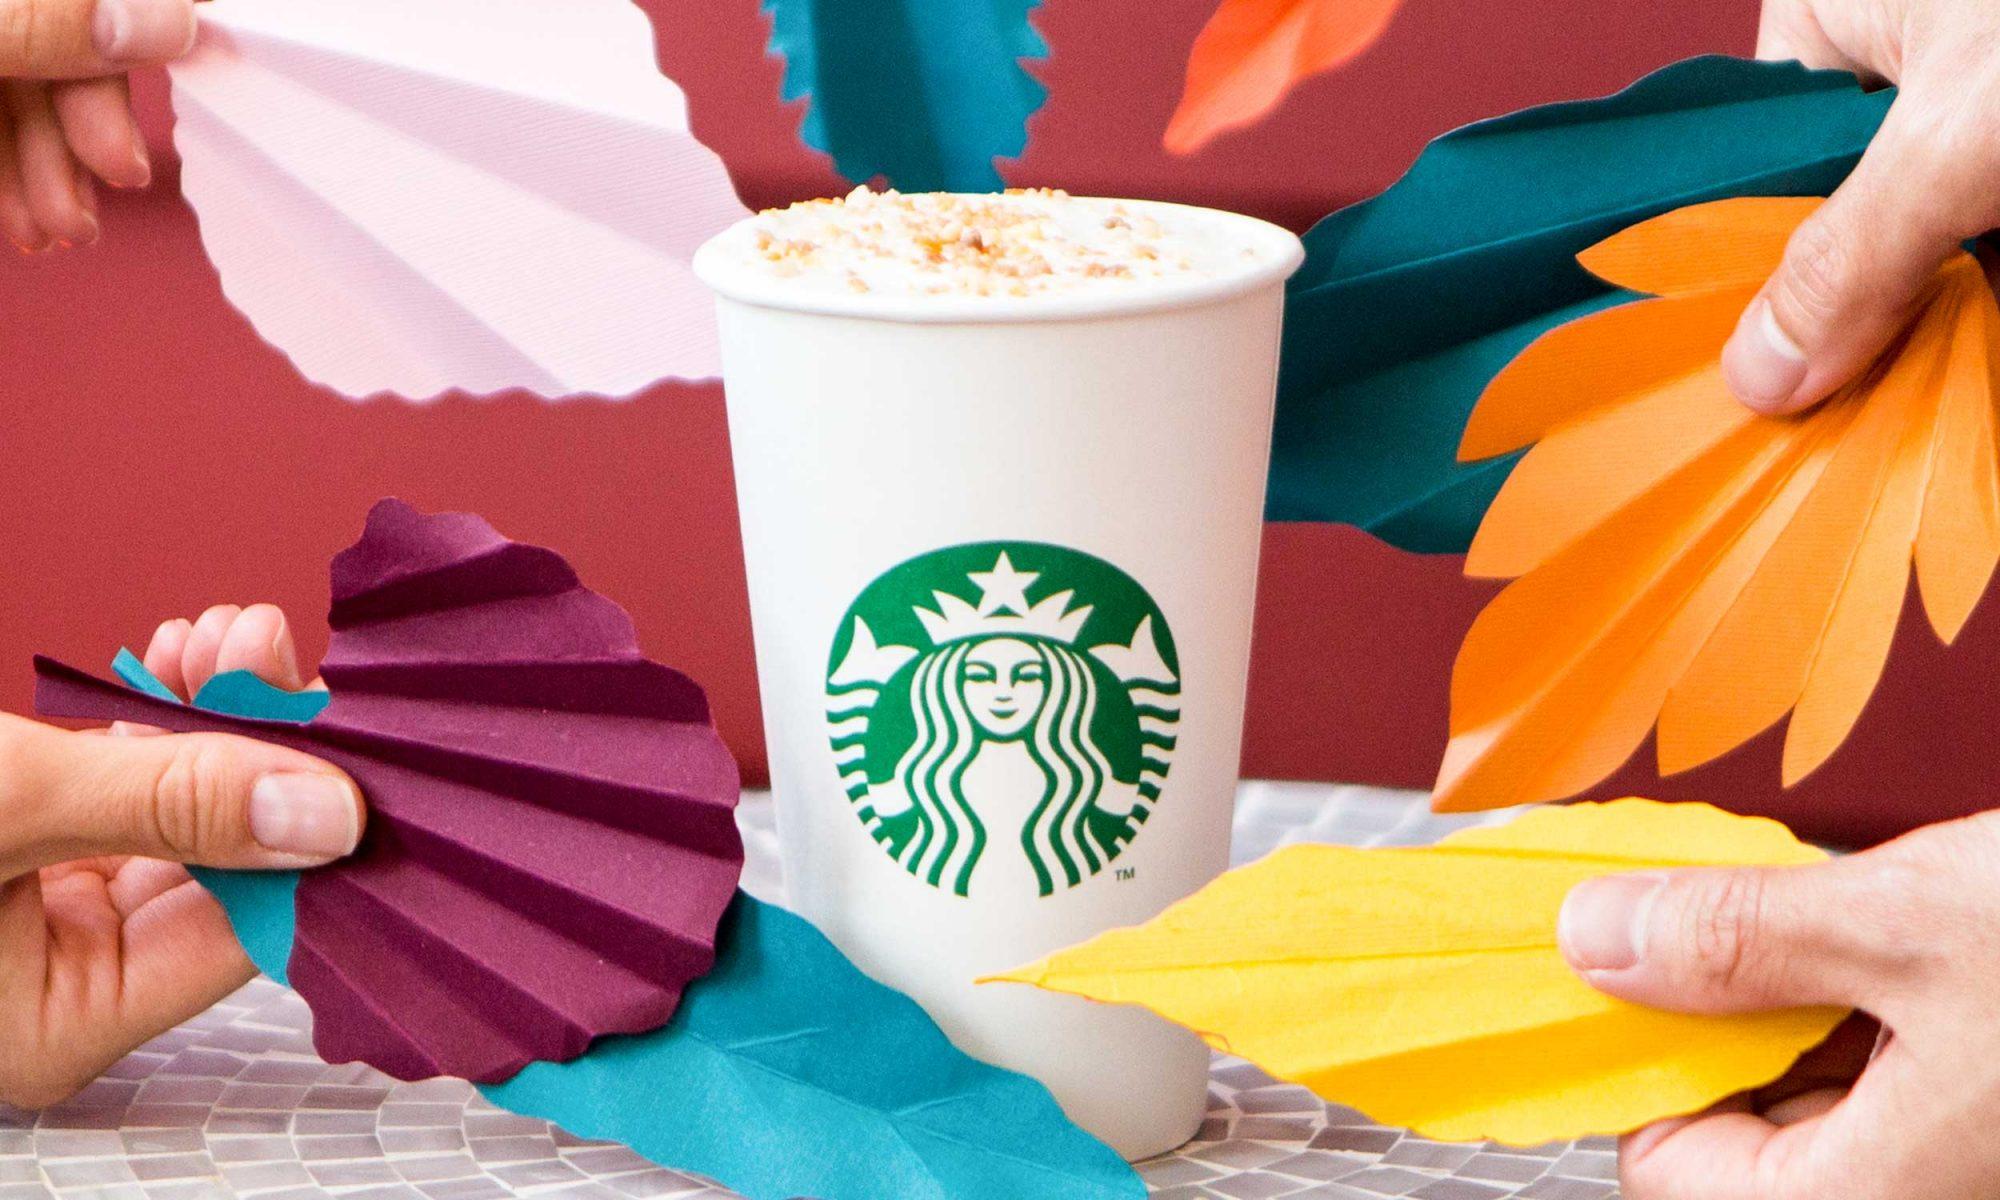 EC: Starbucks' New Fall Drink Is a Maple Pecan Latte